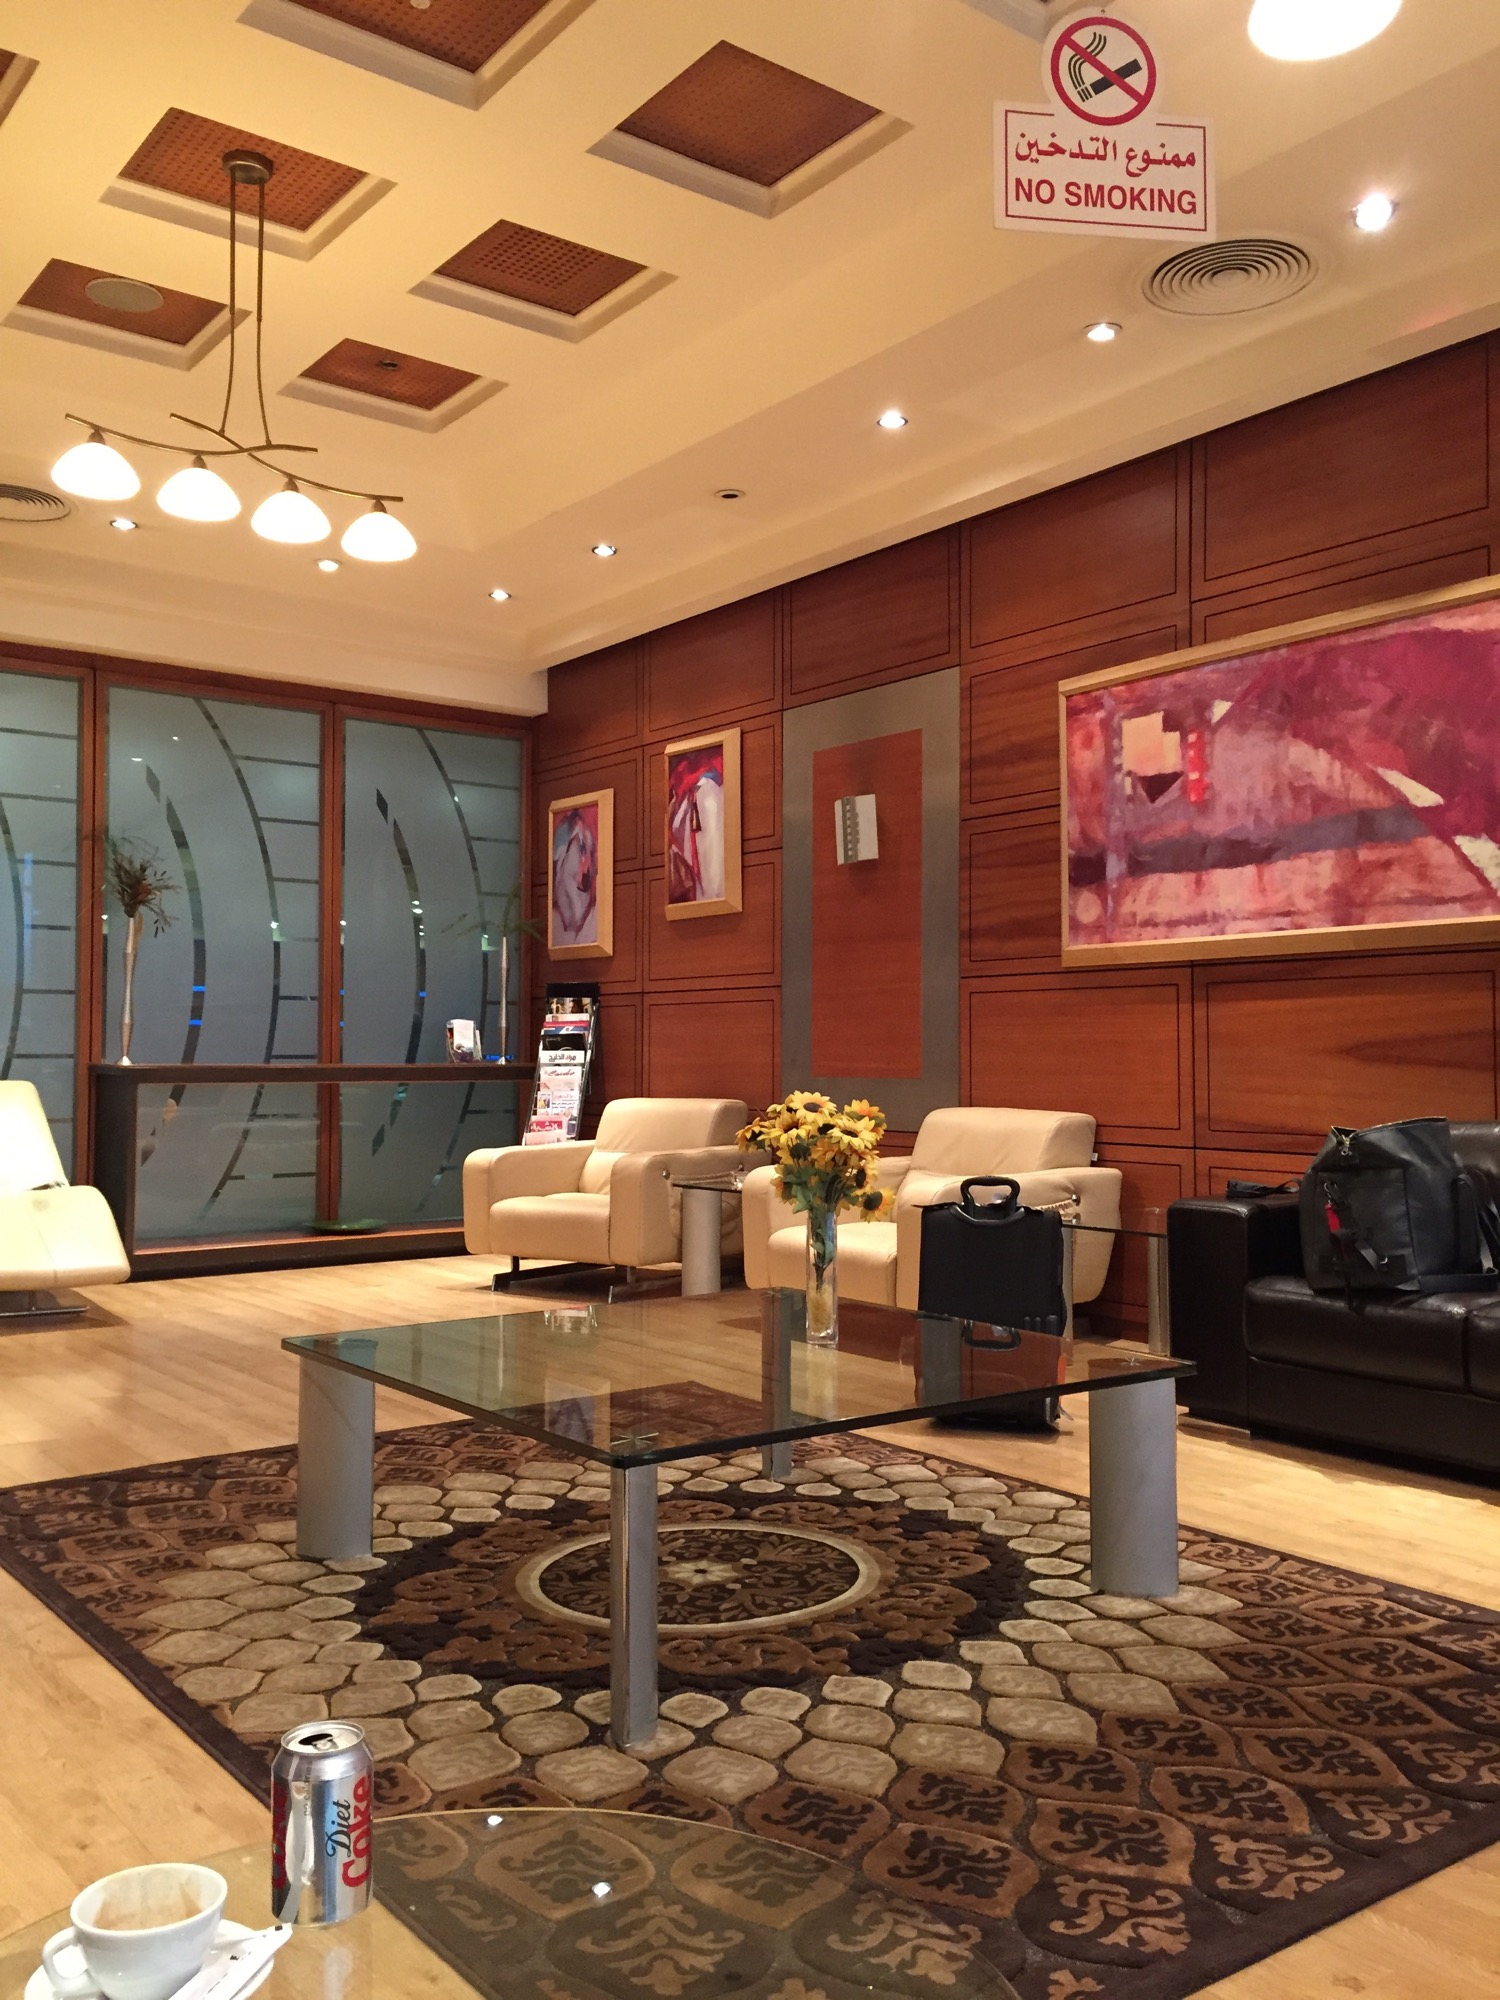 Ahlan VIP Service am Flughafen Kairo  - 5